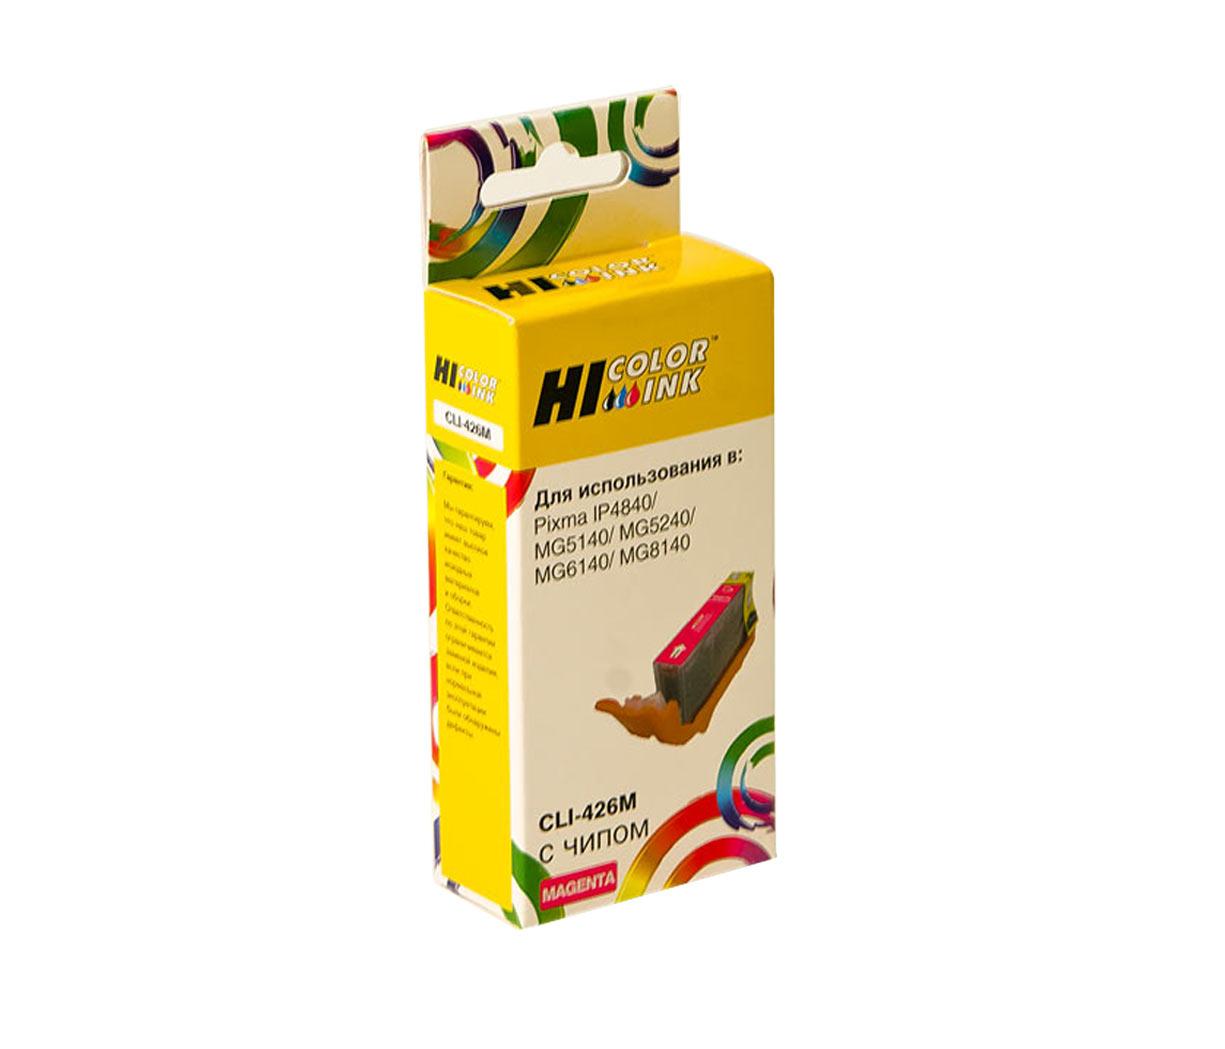 Картридж Hi-Black (HB-CLI-426M) для Canon PIXMA MG5140/5240/6140/8140, M